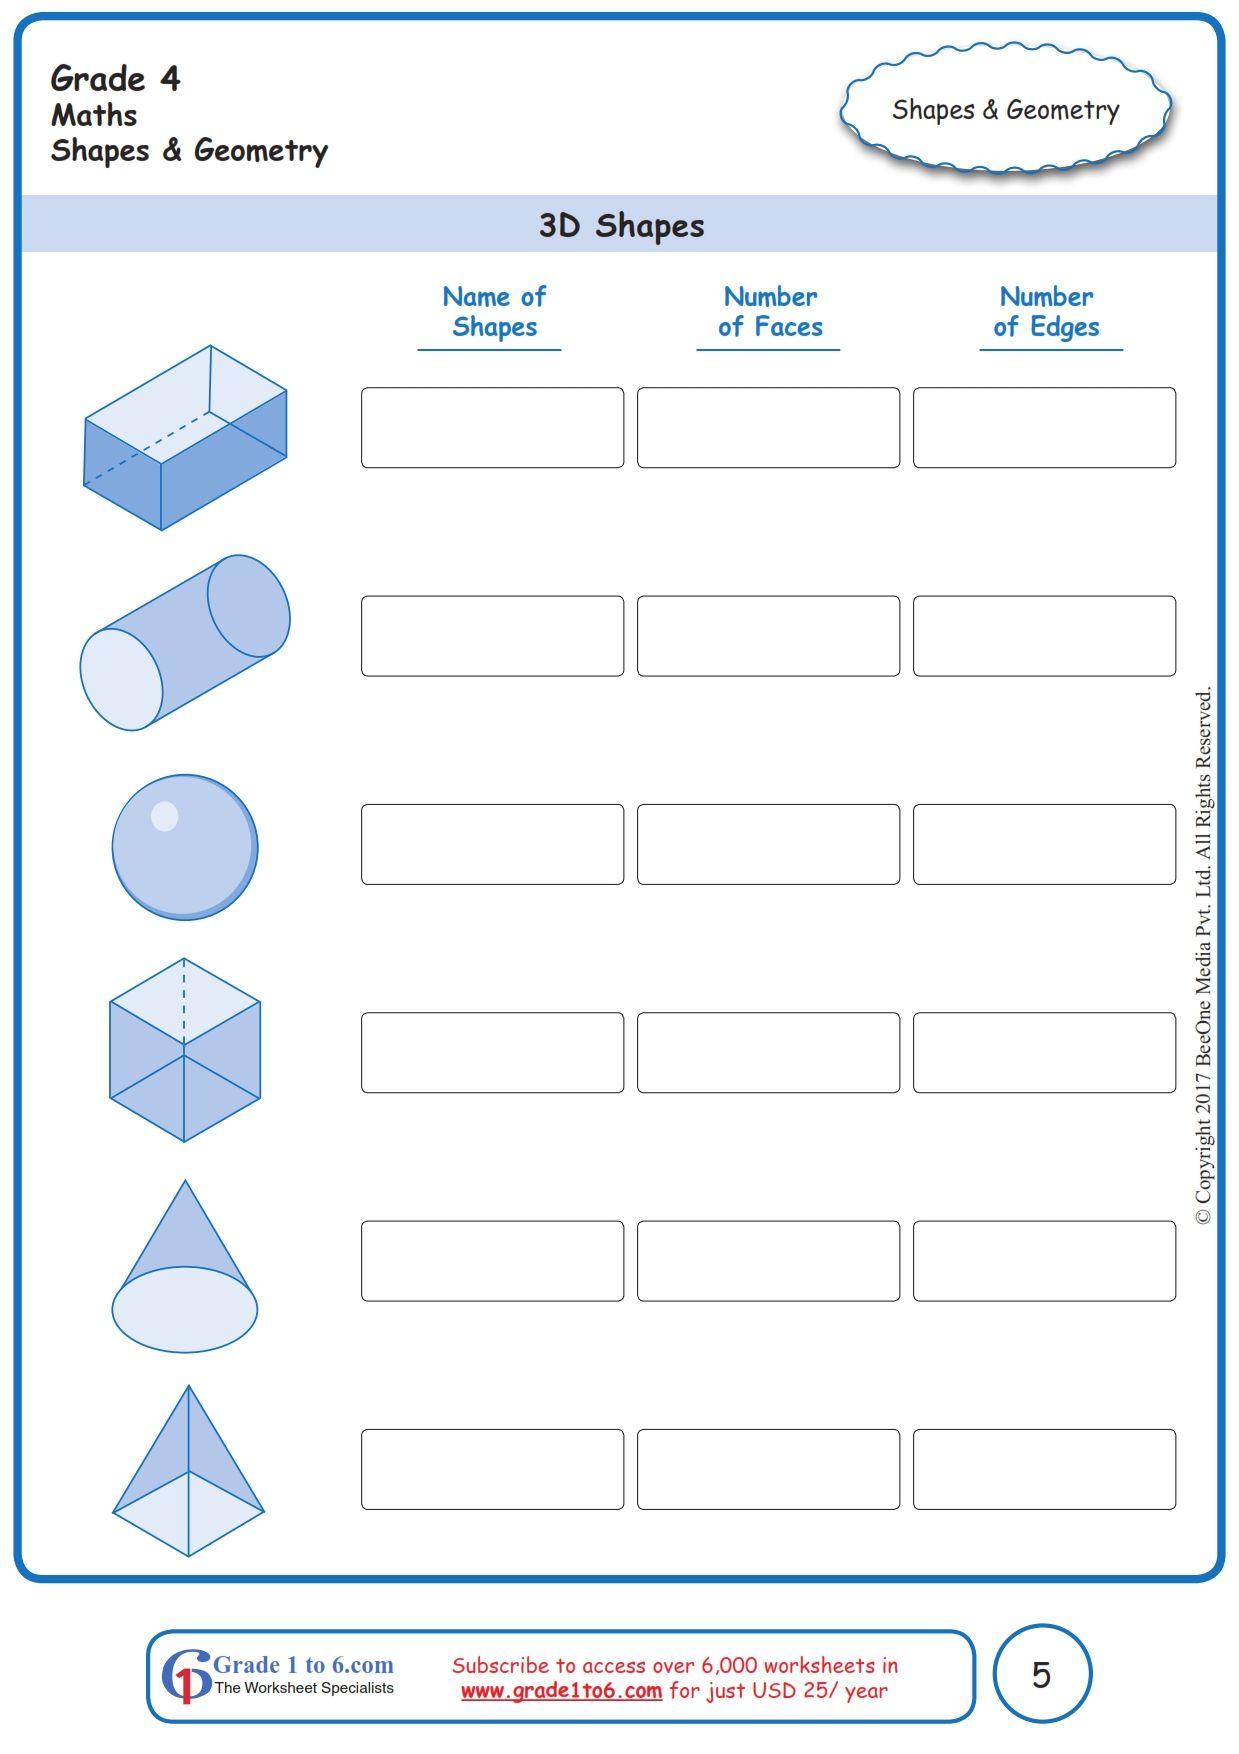 Free Math Worksheets For Grade 1 Through Grade 6